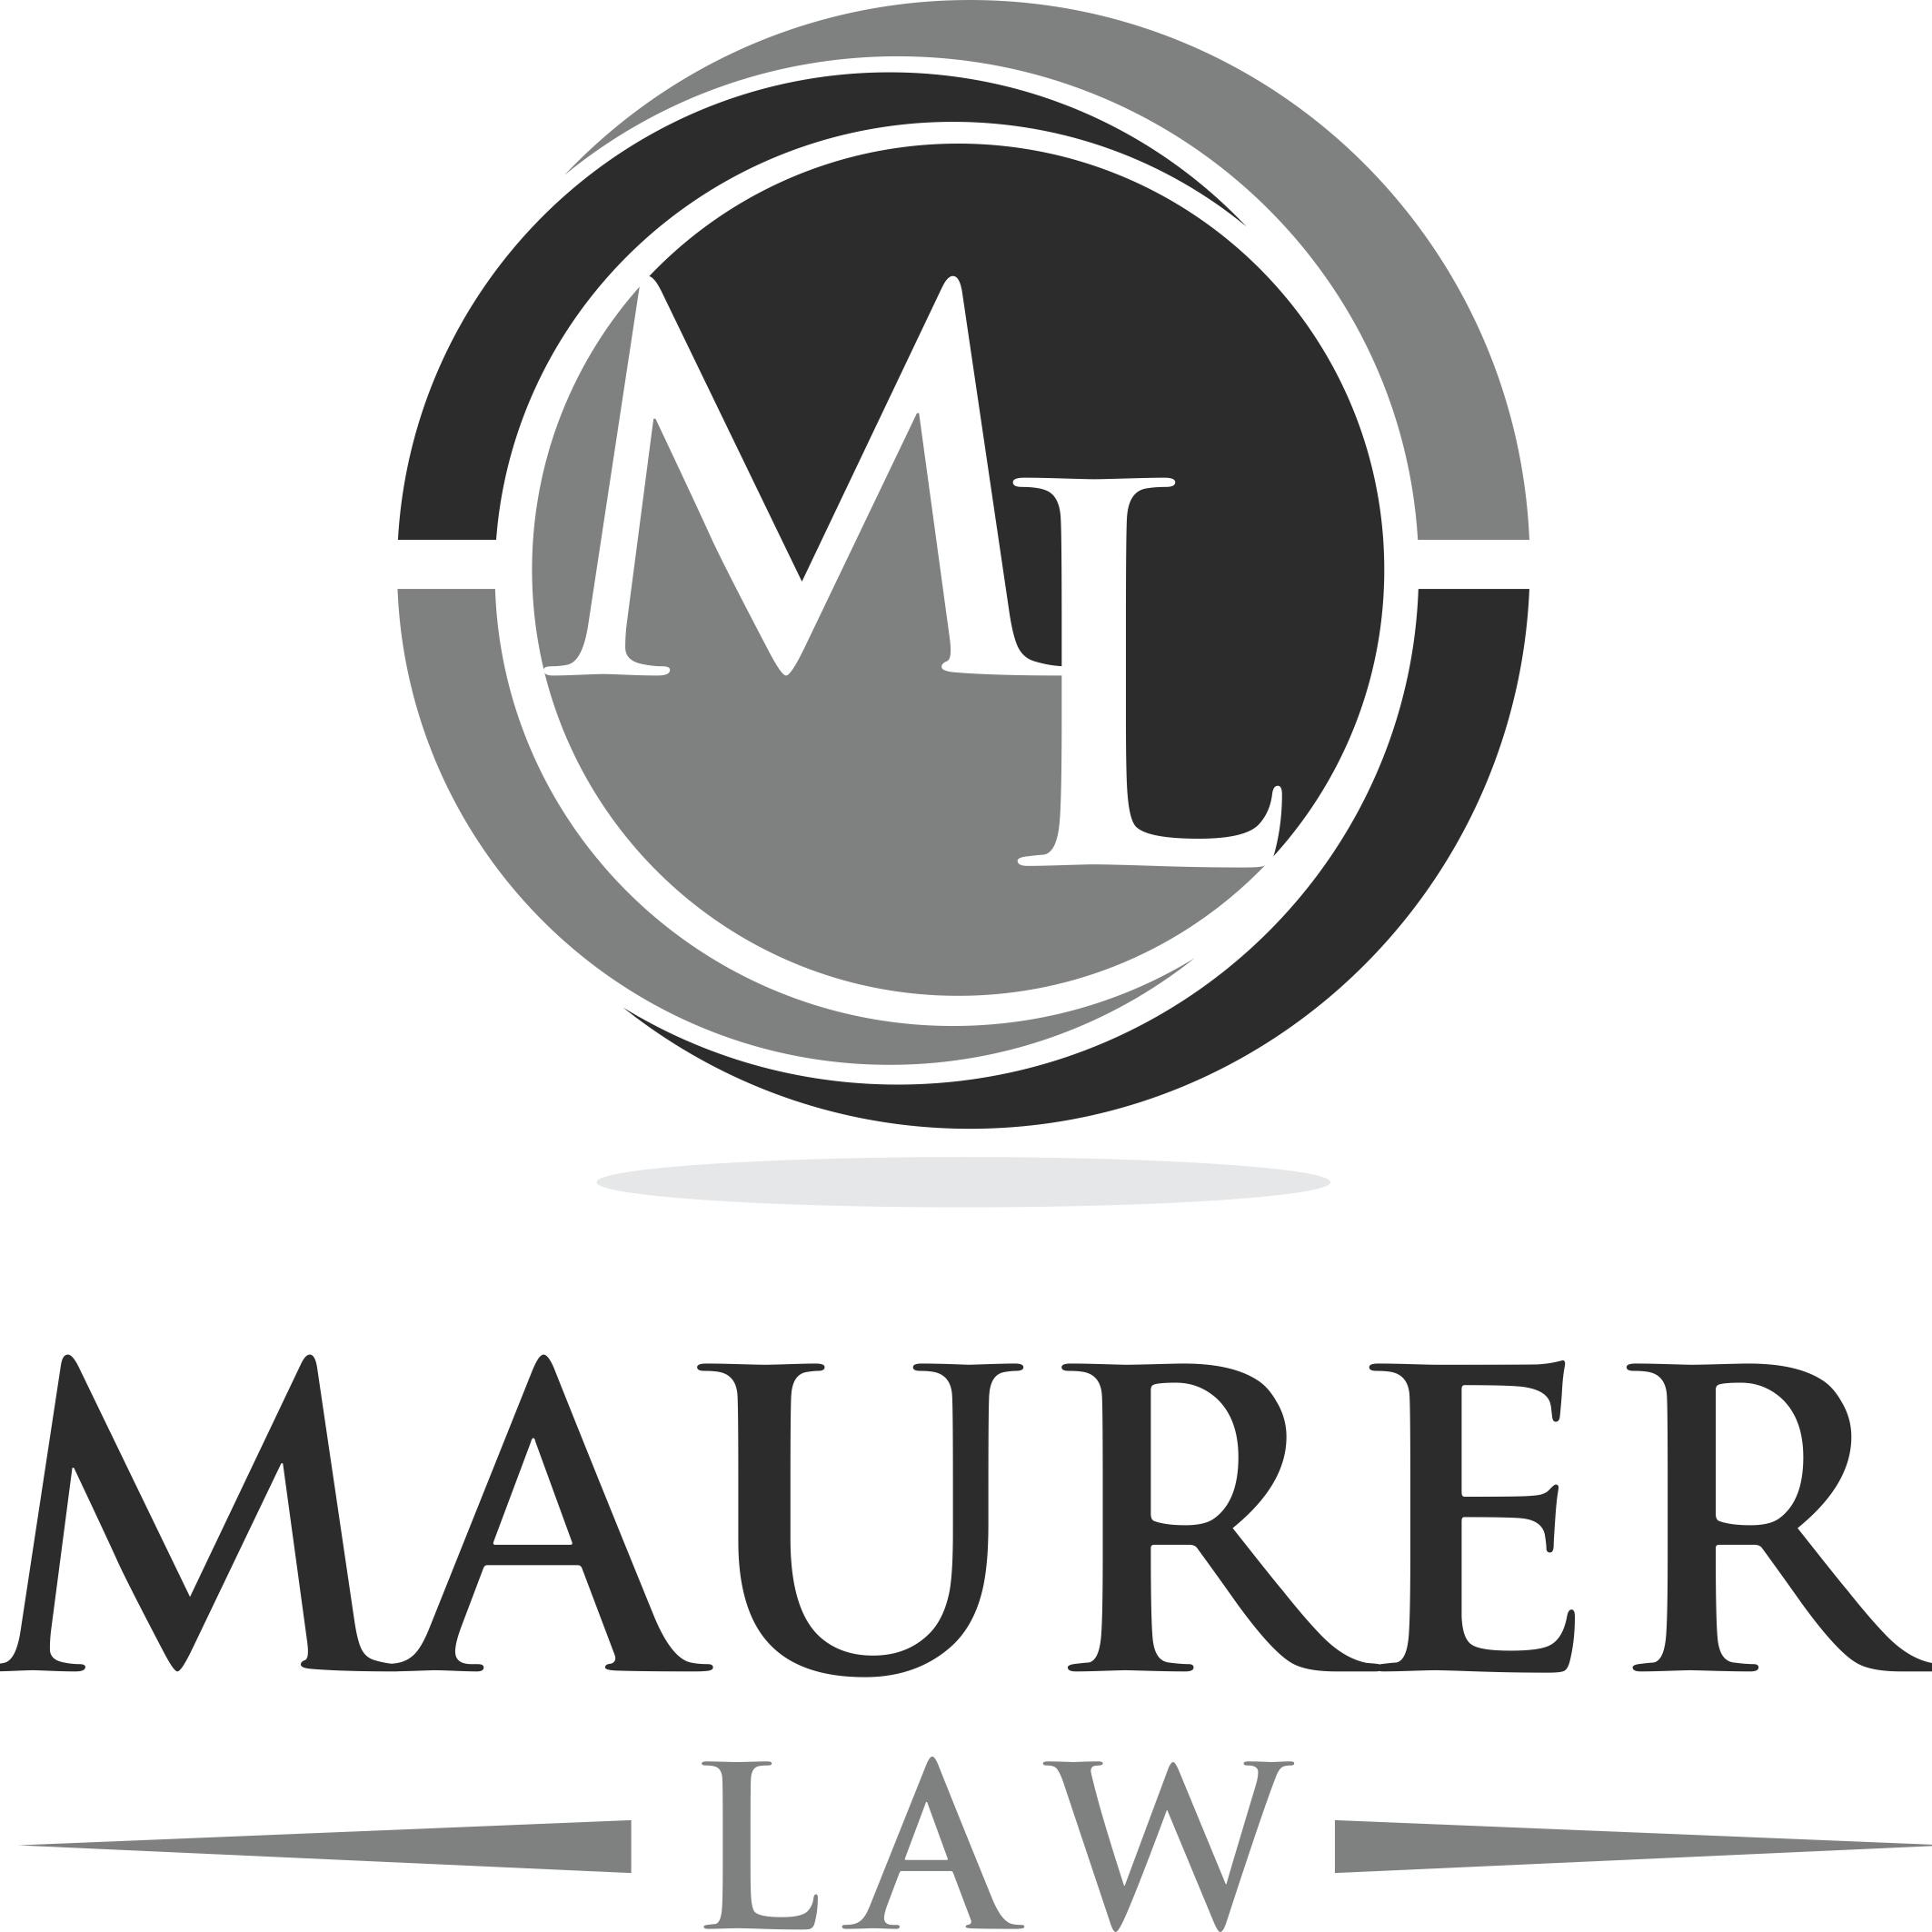 Maurer Law - Raleigh, NC